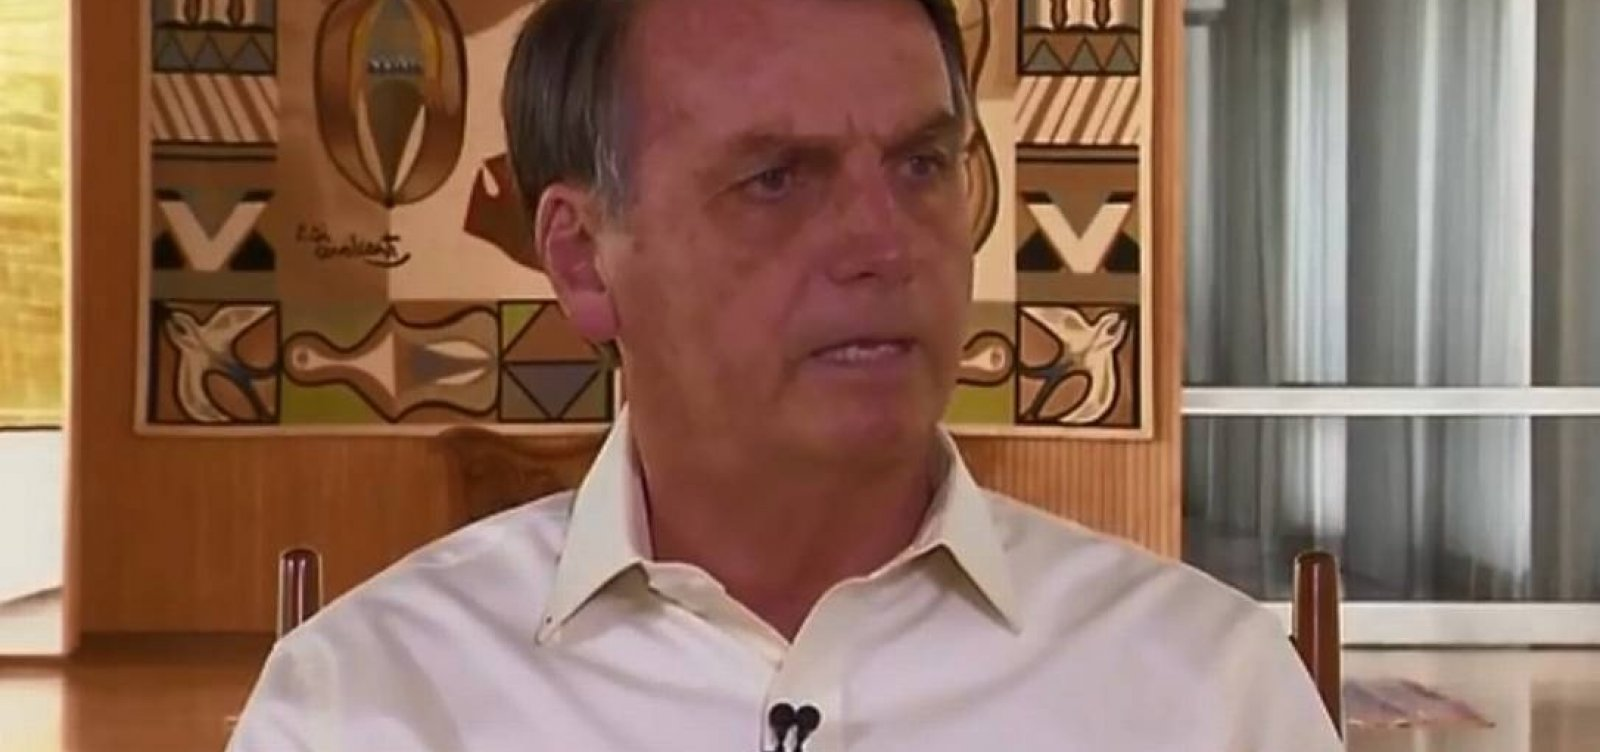 ['O pior está por vir', diz Bolsonaro sobre manchas de óleo no Nordeste]